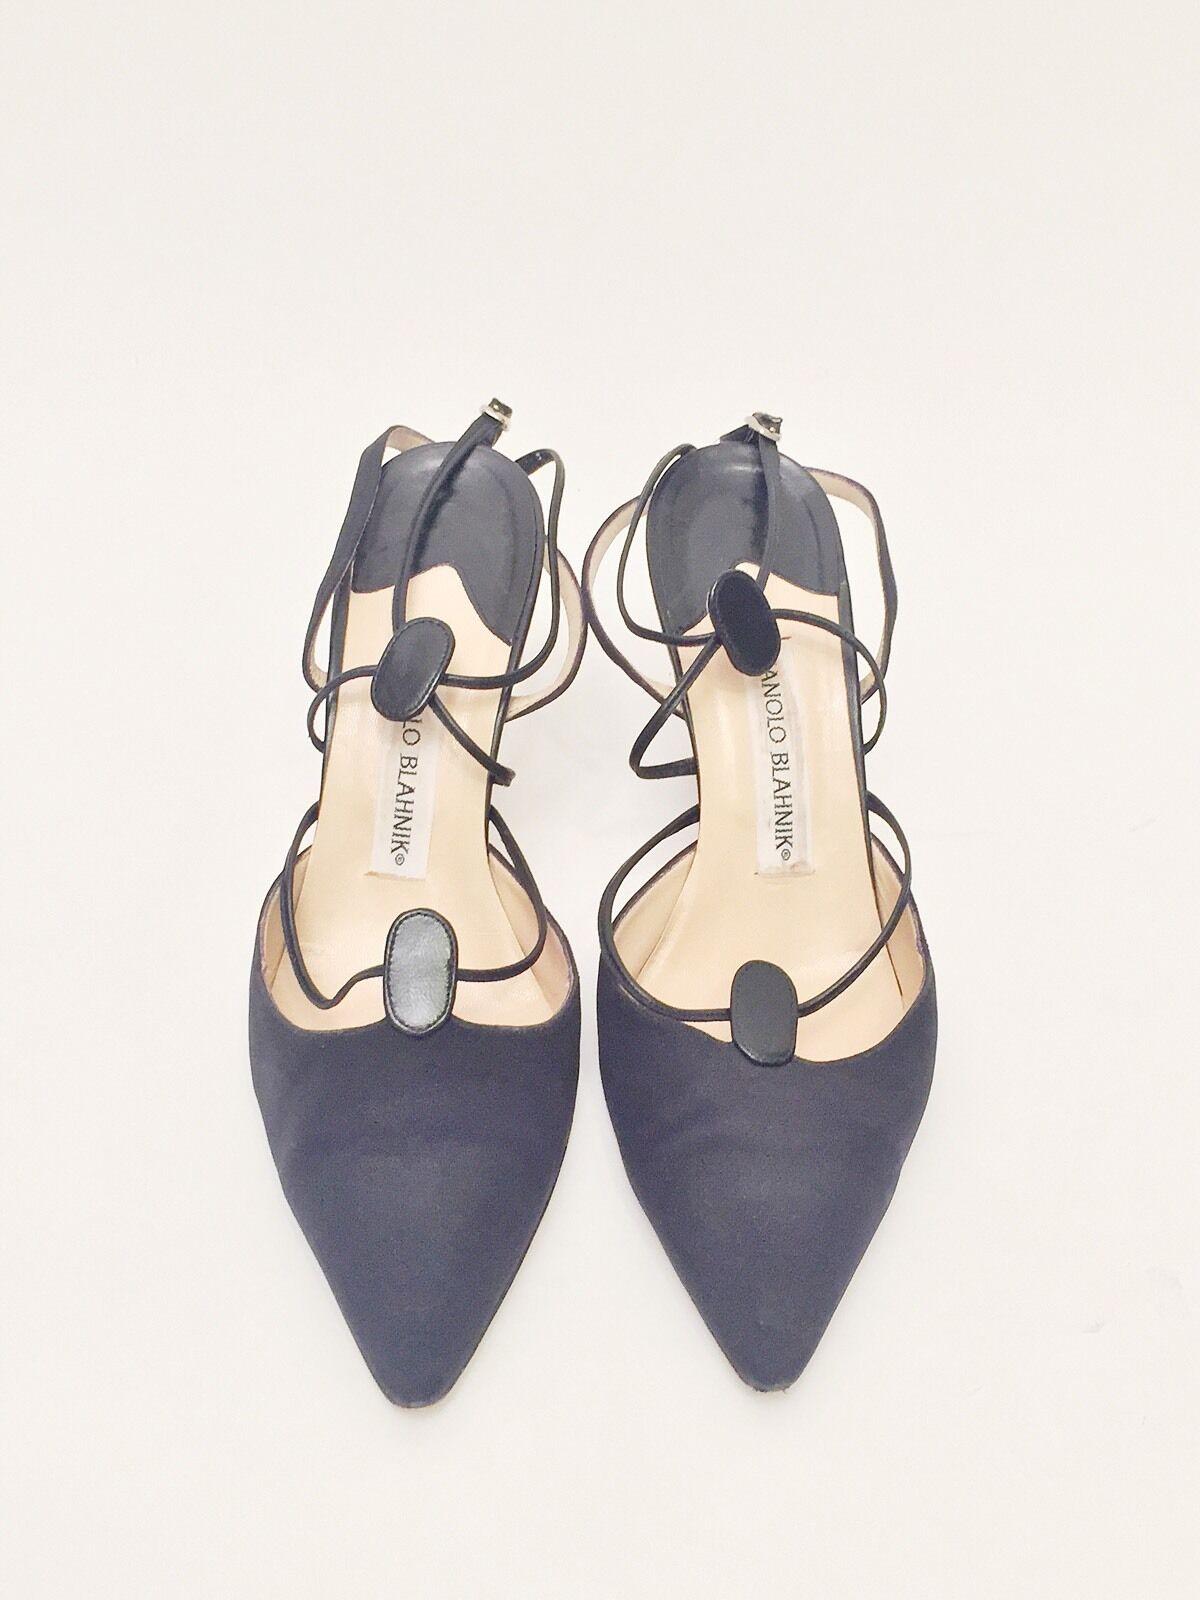 Manolo Blahnik Ladies Size 38.5 Black Closed Toe Heels